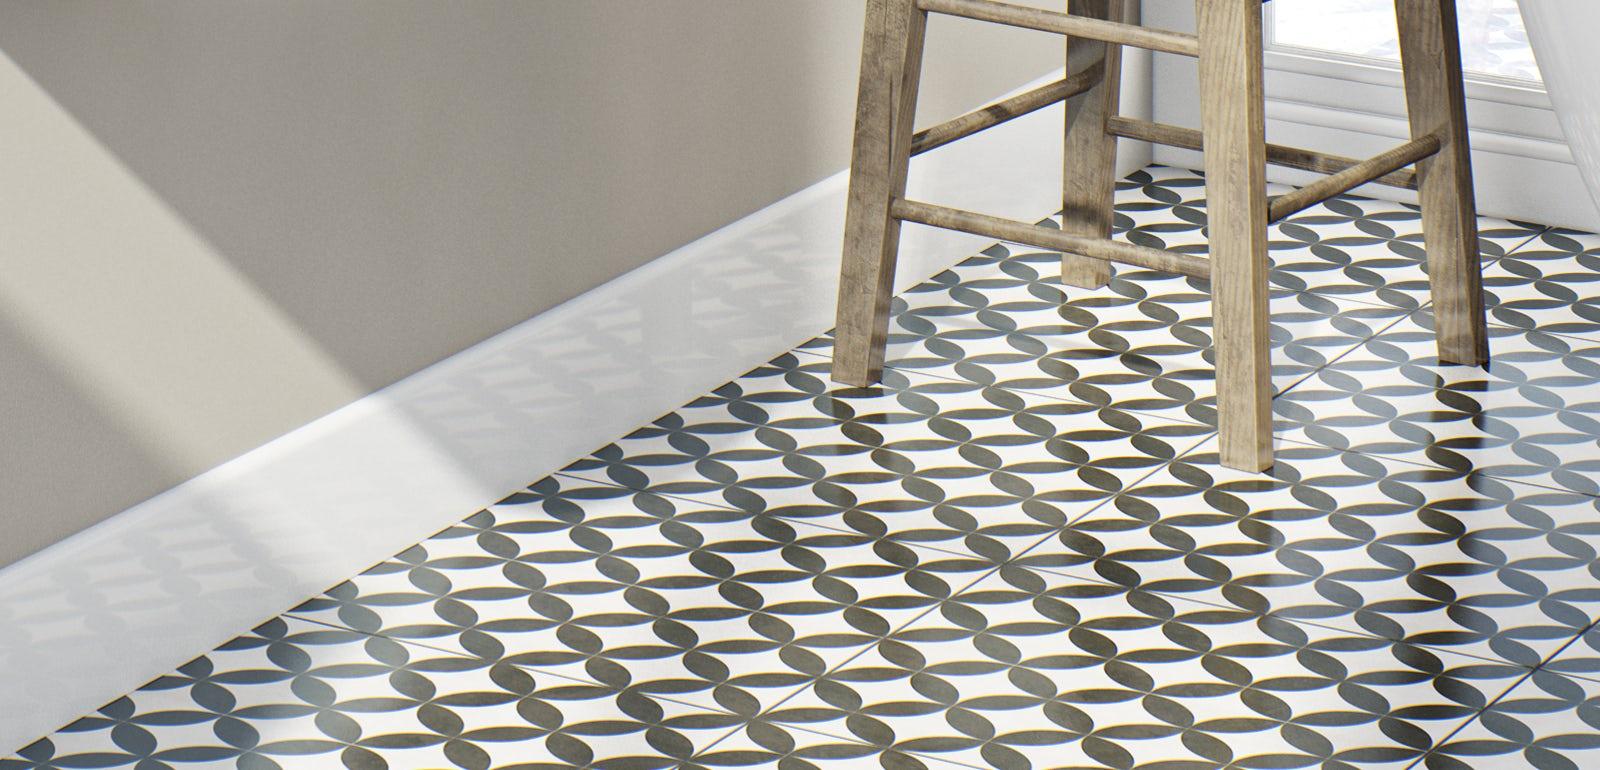 5 Great Bathroom Flooring Ideas  VictoriaPlumcom